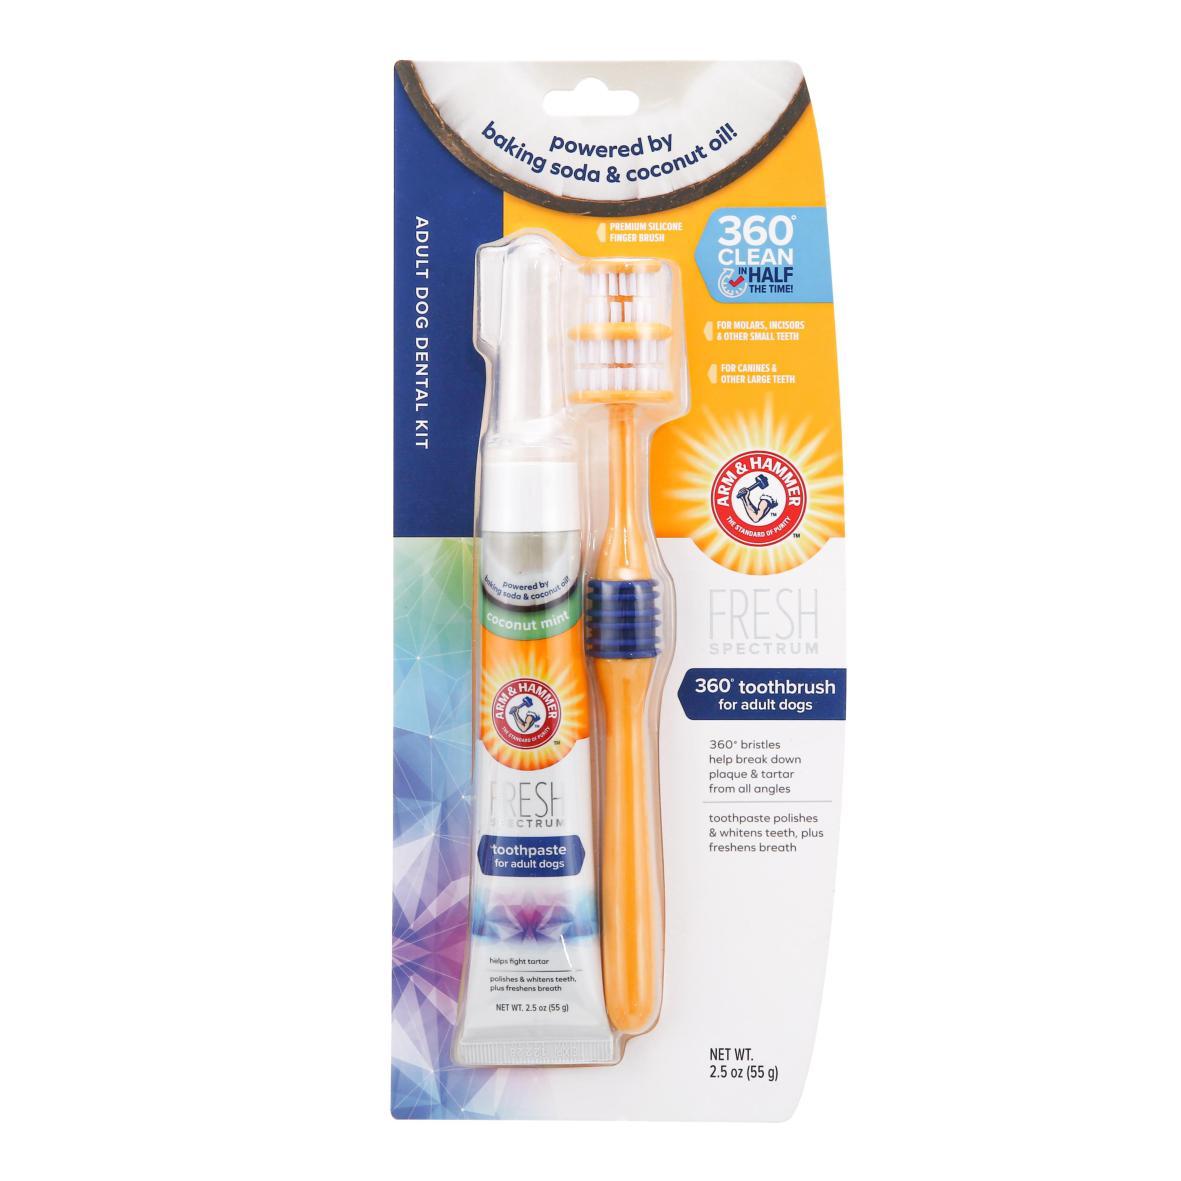 Arm & Hammer Adult Dog Dental Kit with 360° Toothbrush, Finger Brush & Toothpaste 55g